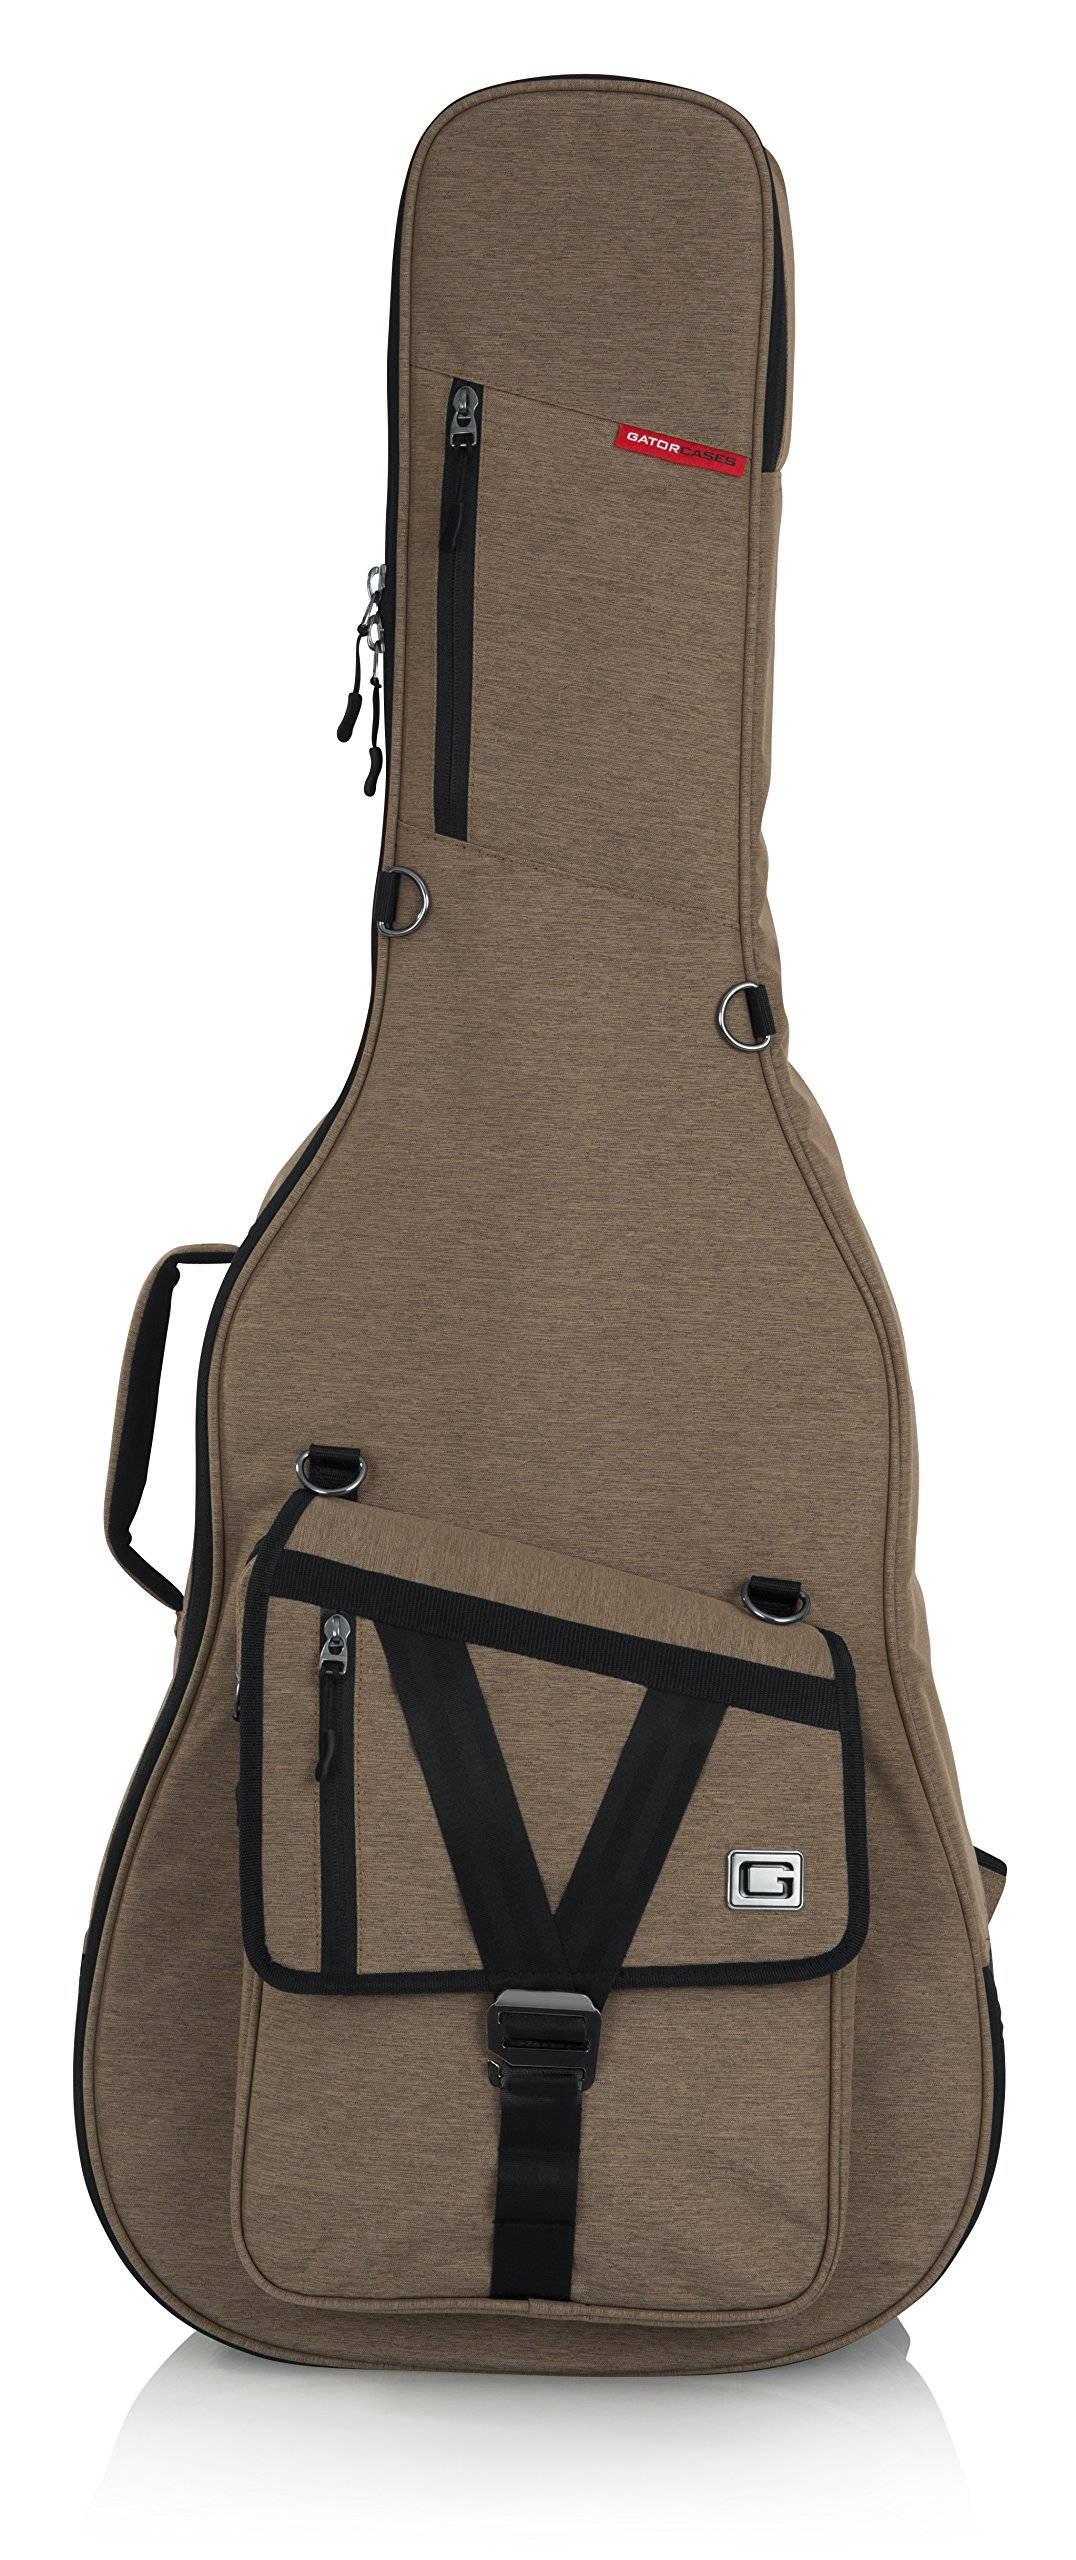 Gator Cases Transit Series Acoustic Guitar Gig Bag; Tan Exterior (GT-ACOUSTIC-TAN) by Gator